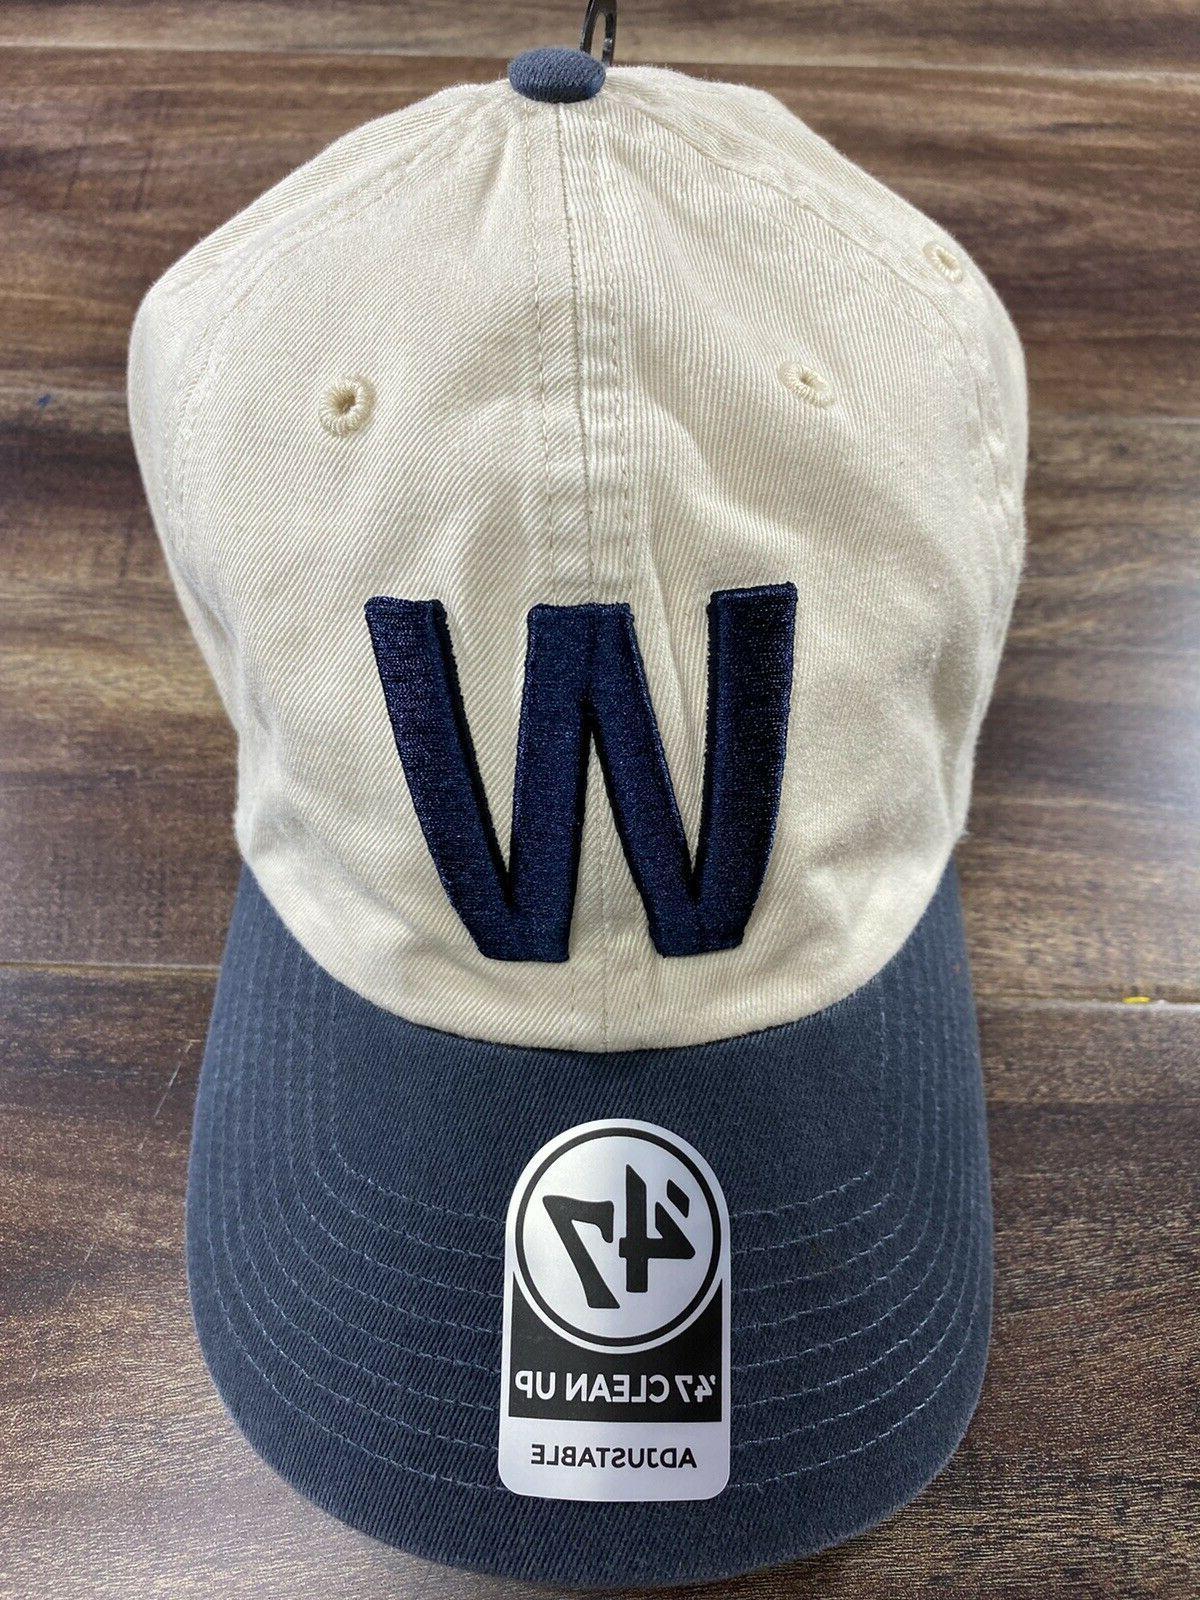 Chicago Cap Strapback Hat pick